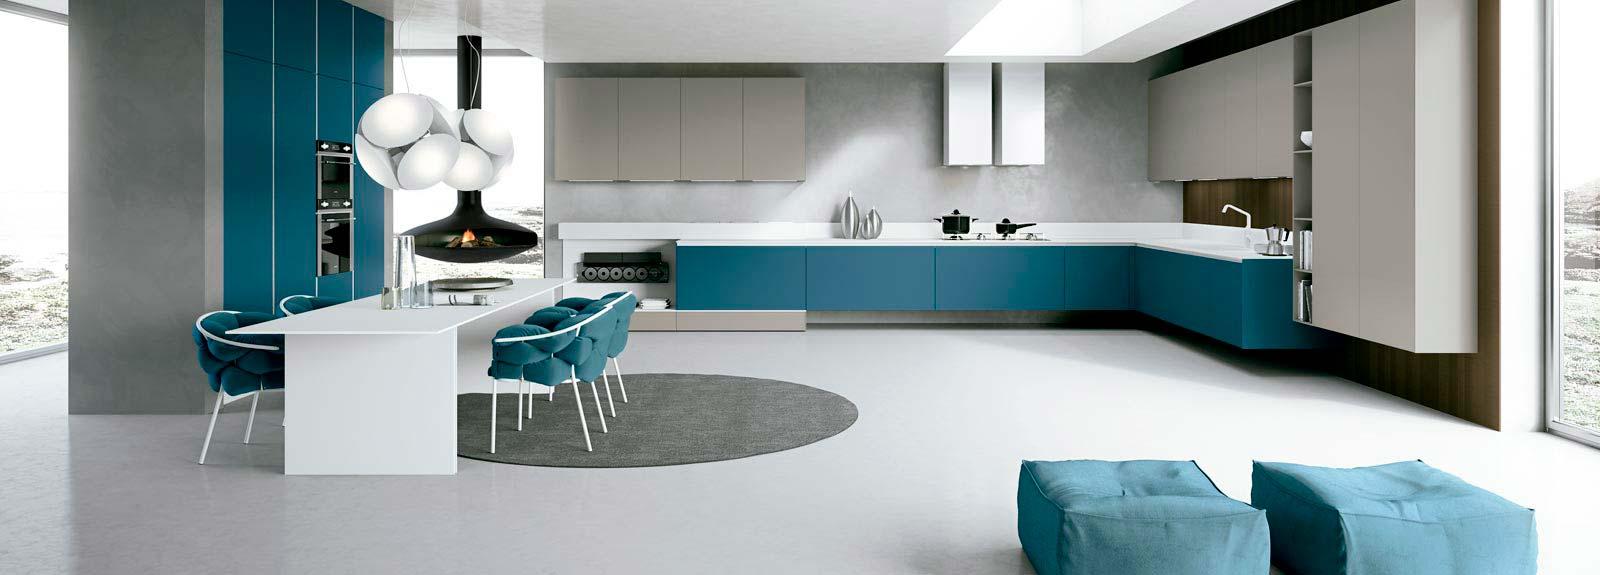 kitchen-furniture-murcia-stancia-6